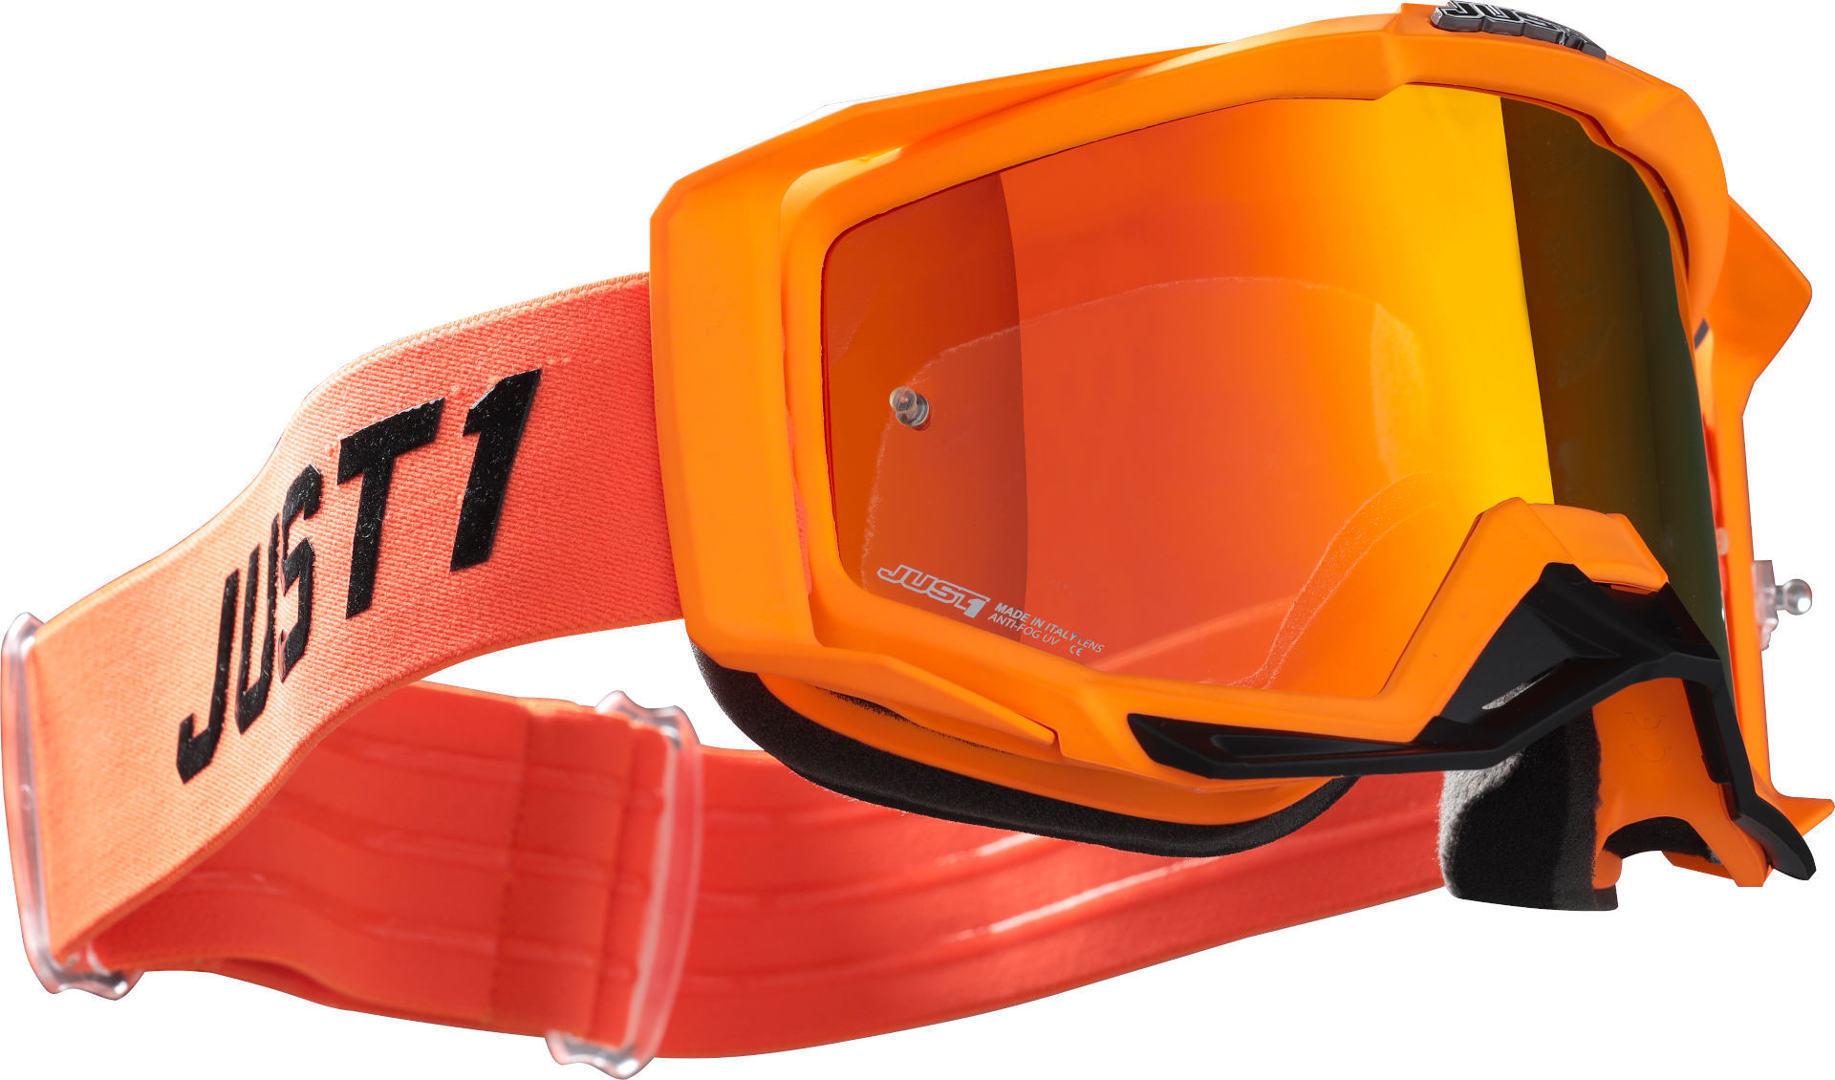 Just1 Iris Pulsar Motocross Goggles Orange Image